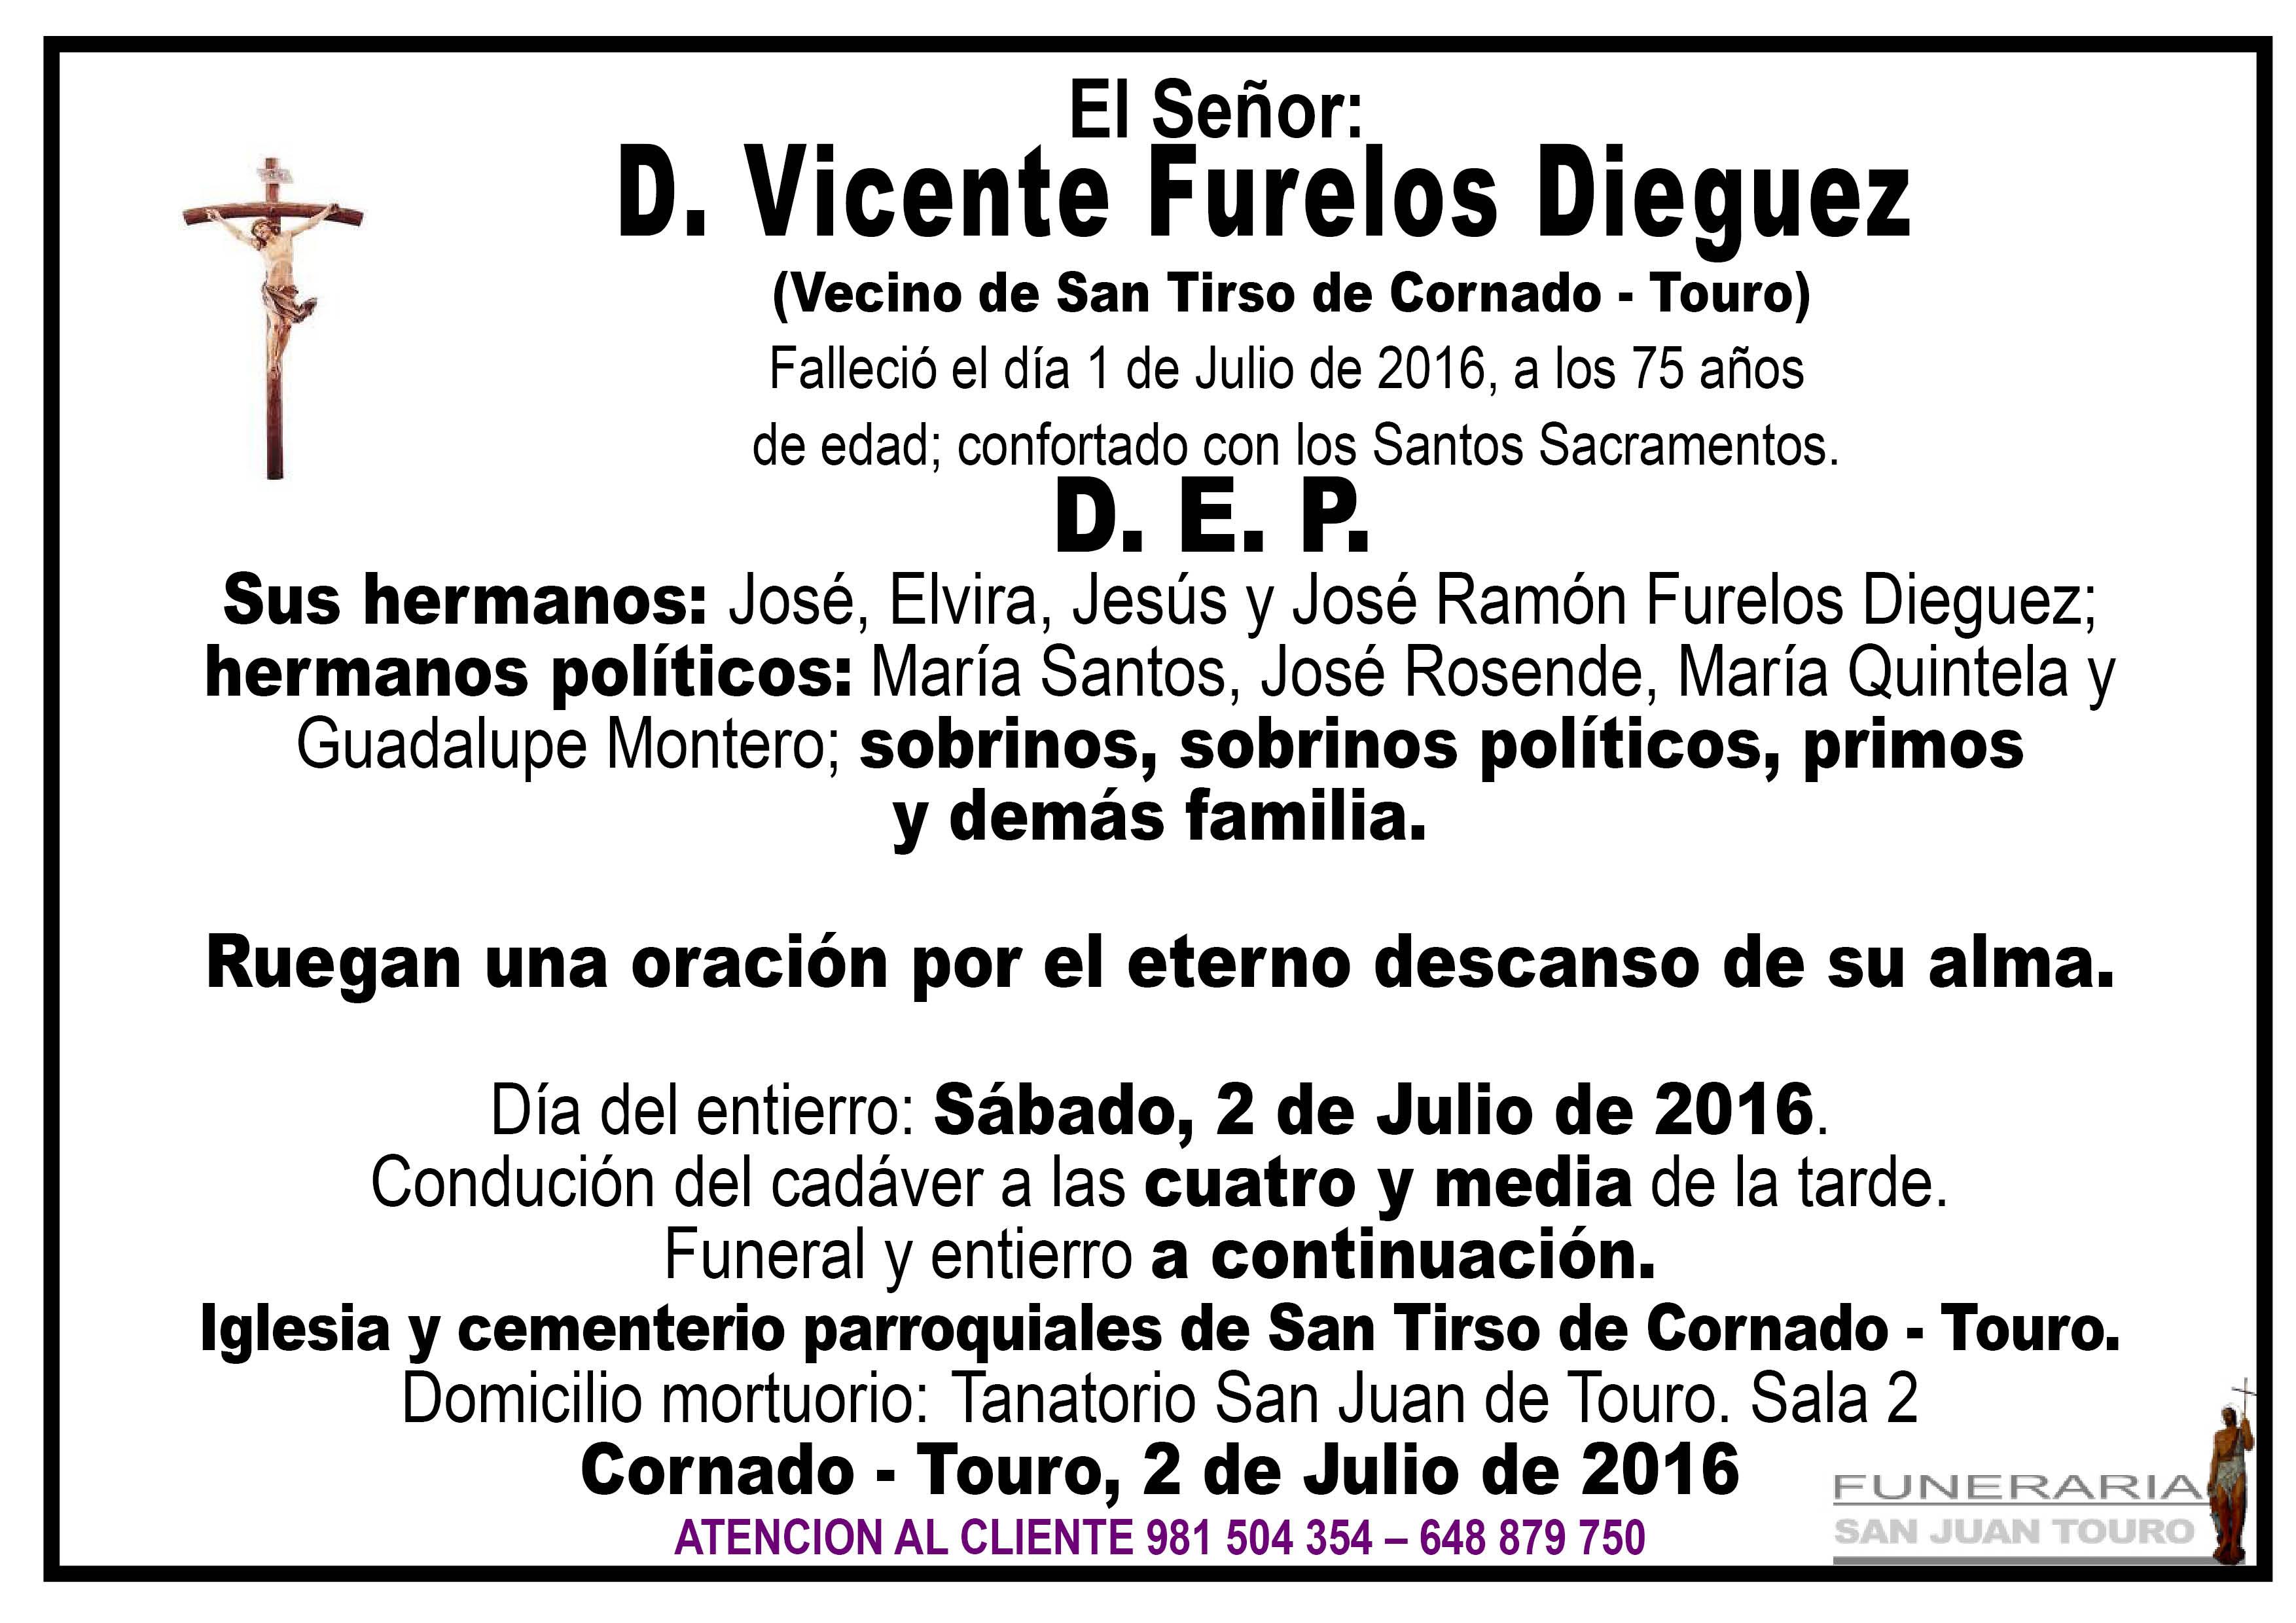 Esquela de SEPELIO D. VICNETE FURELOS DIEGUEZ